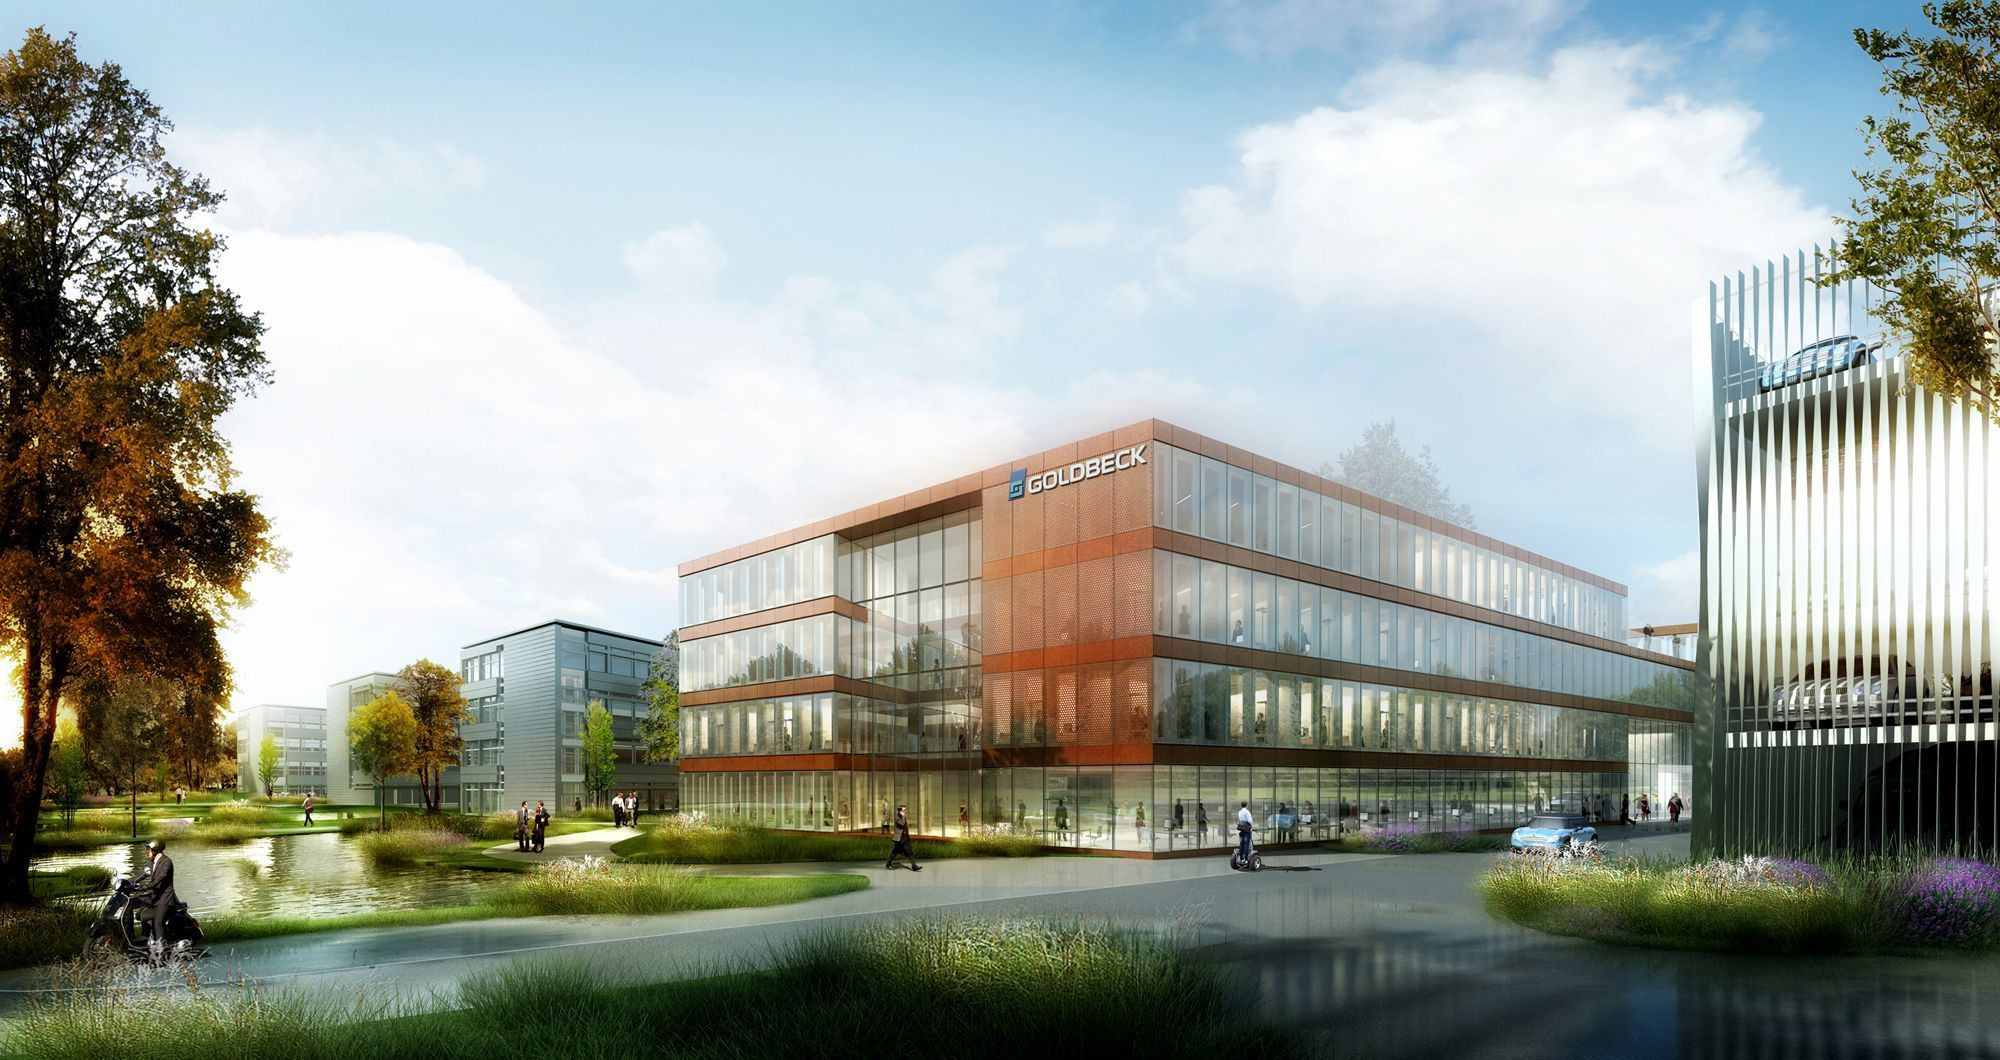 Visualisierung: © sop architekten, Rendering: formtool Anton Kolev